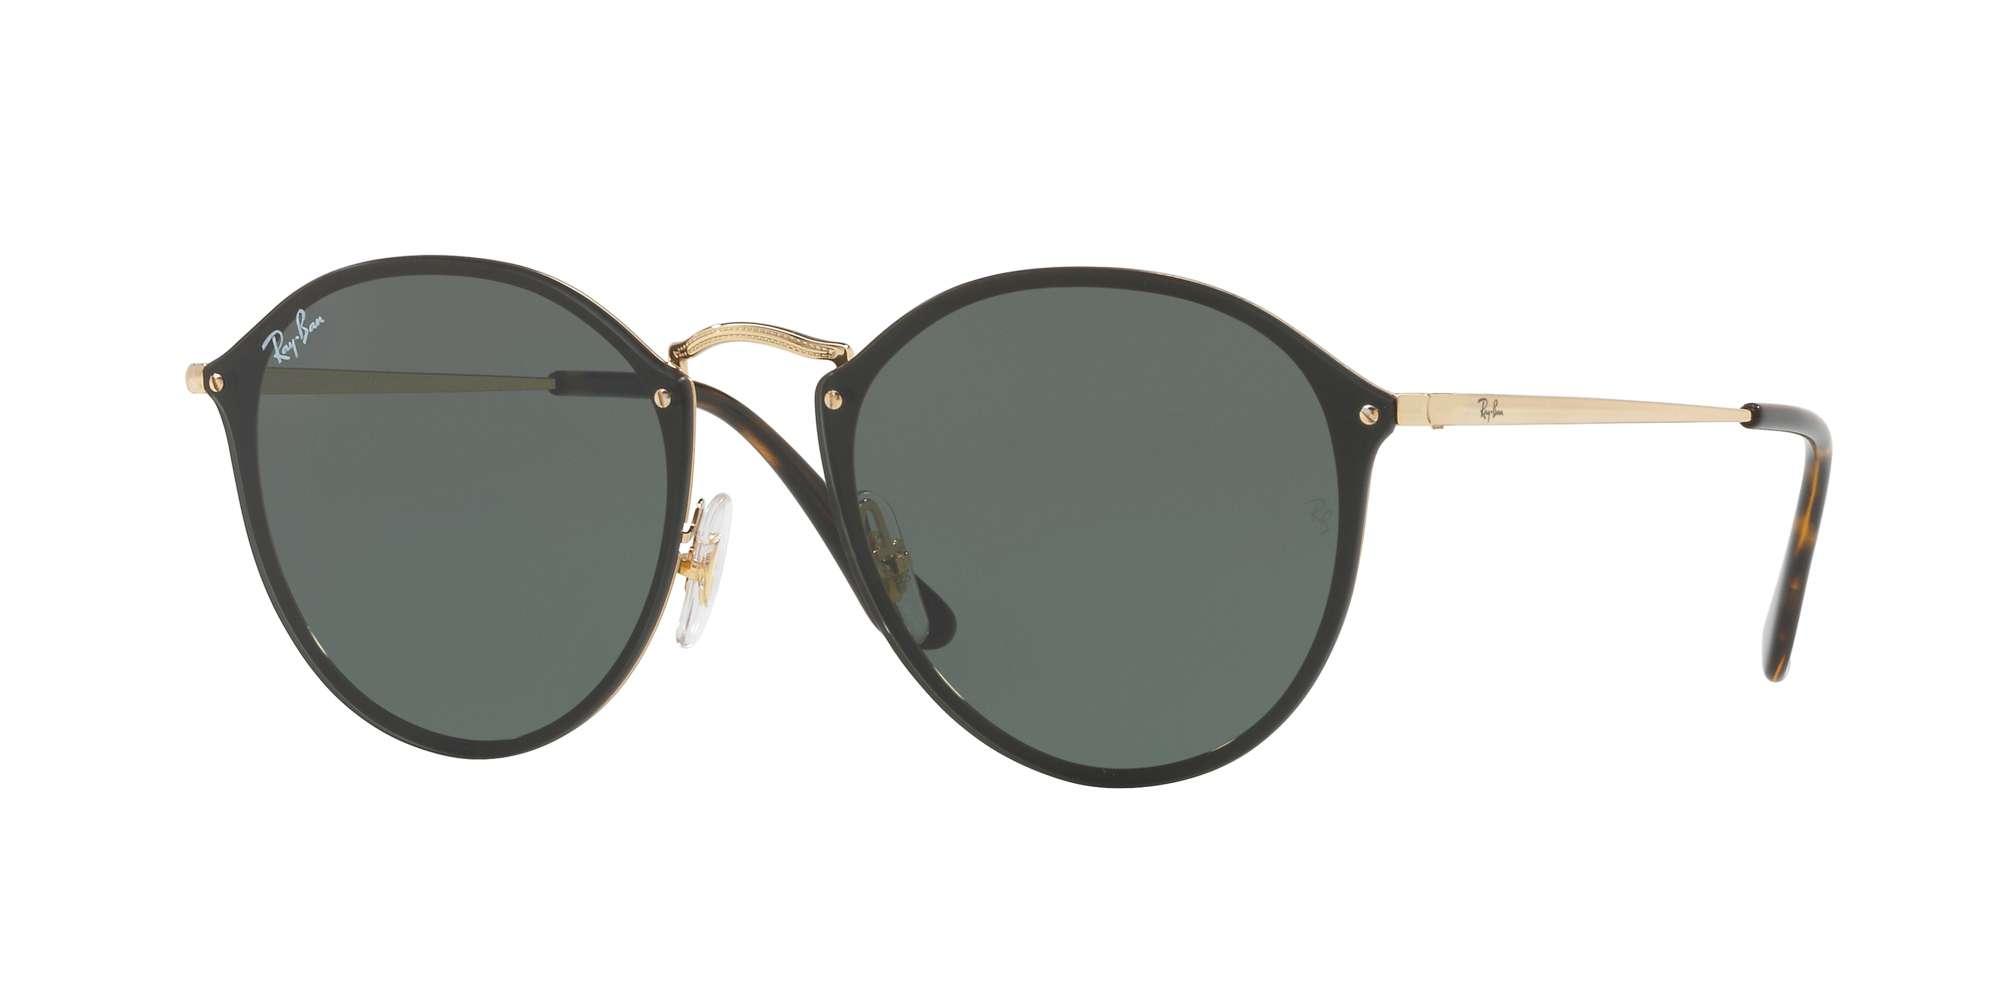 ARISTA / GREEN lenses